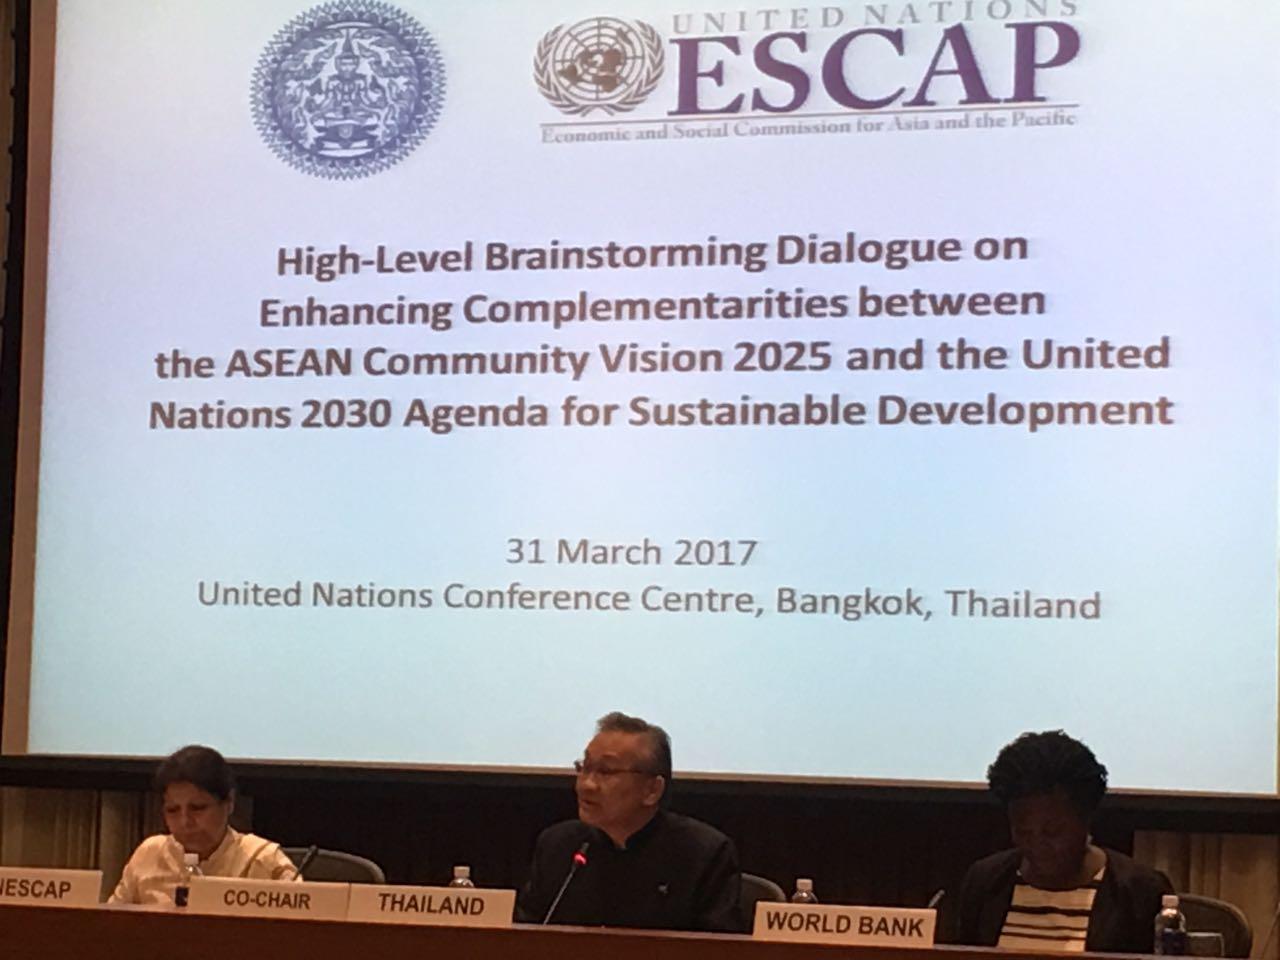 Through our #partnership, I'm convinced that we can achieve our goals together - Thai Foreign Min Don Pramudwinai #ASEAN2025 #2030Agenda https://t.co/ar5ksvfwfZ